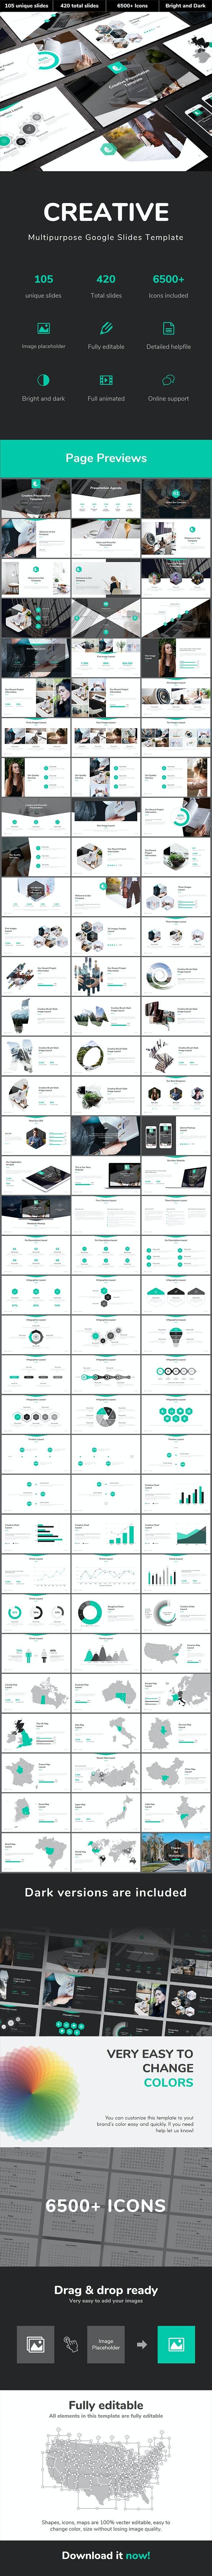 Creative Multipurpose Google Slides Template - Google Slides Presentation Templates